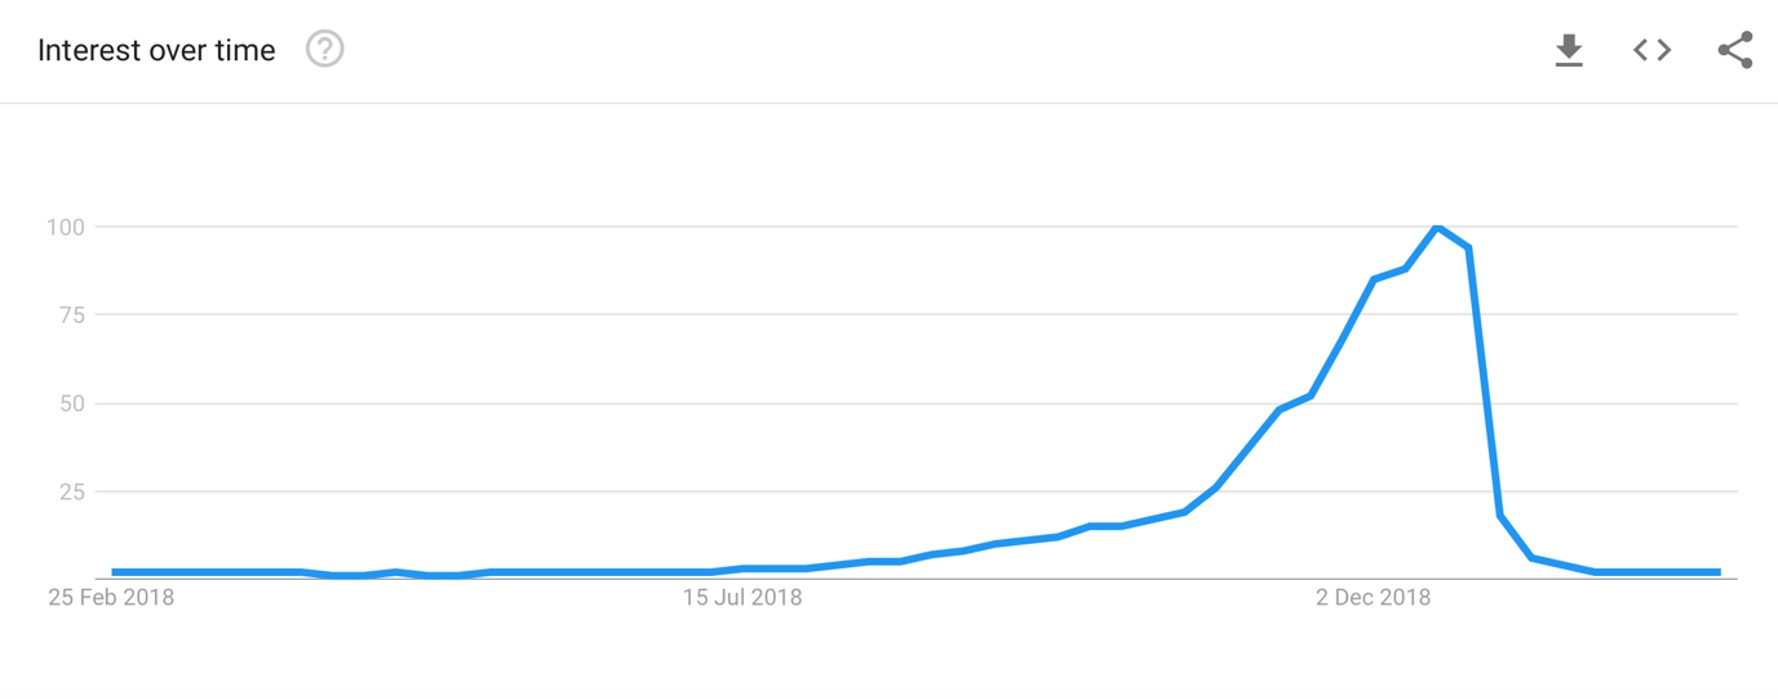 Keyword trends graph for Christmas